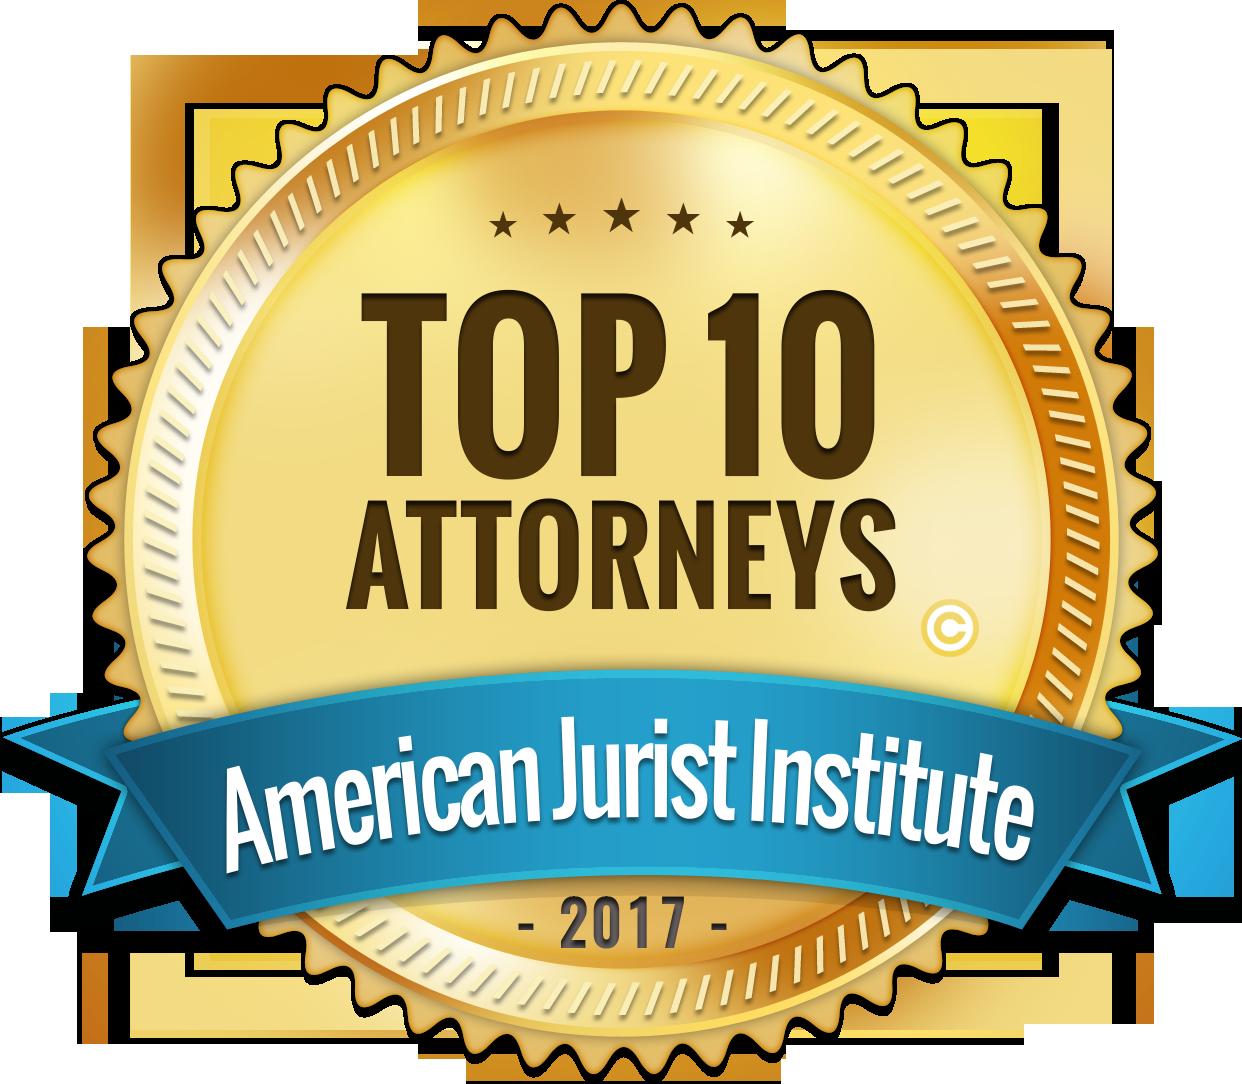 2017 AJI Top 10